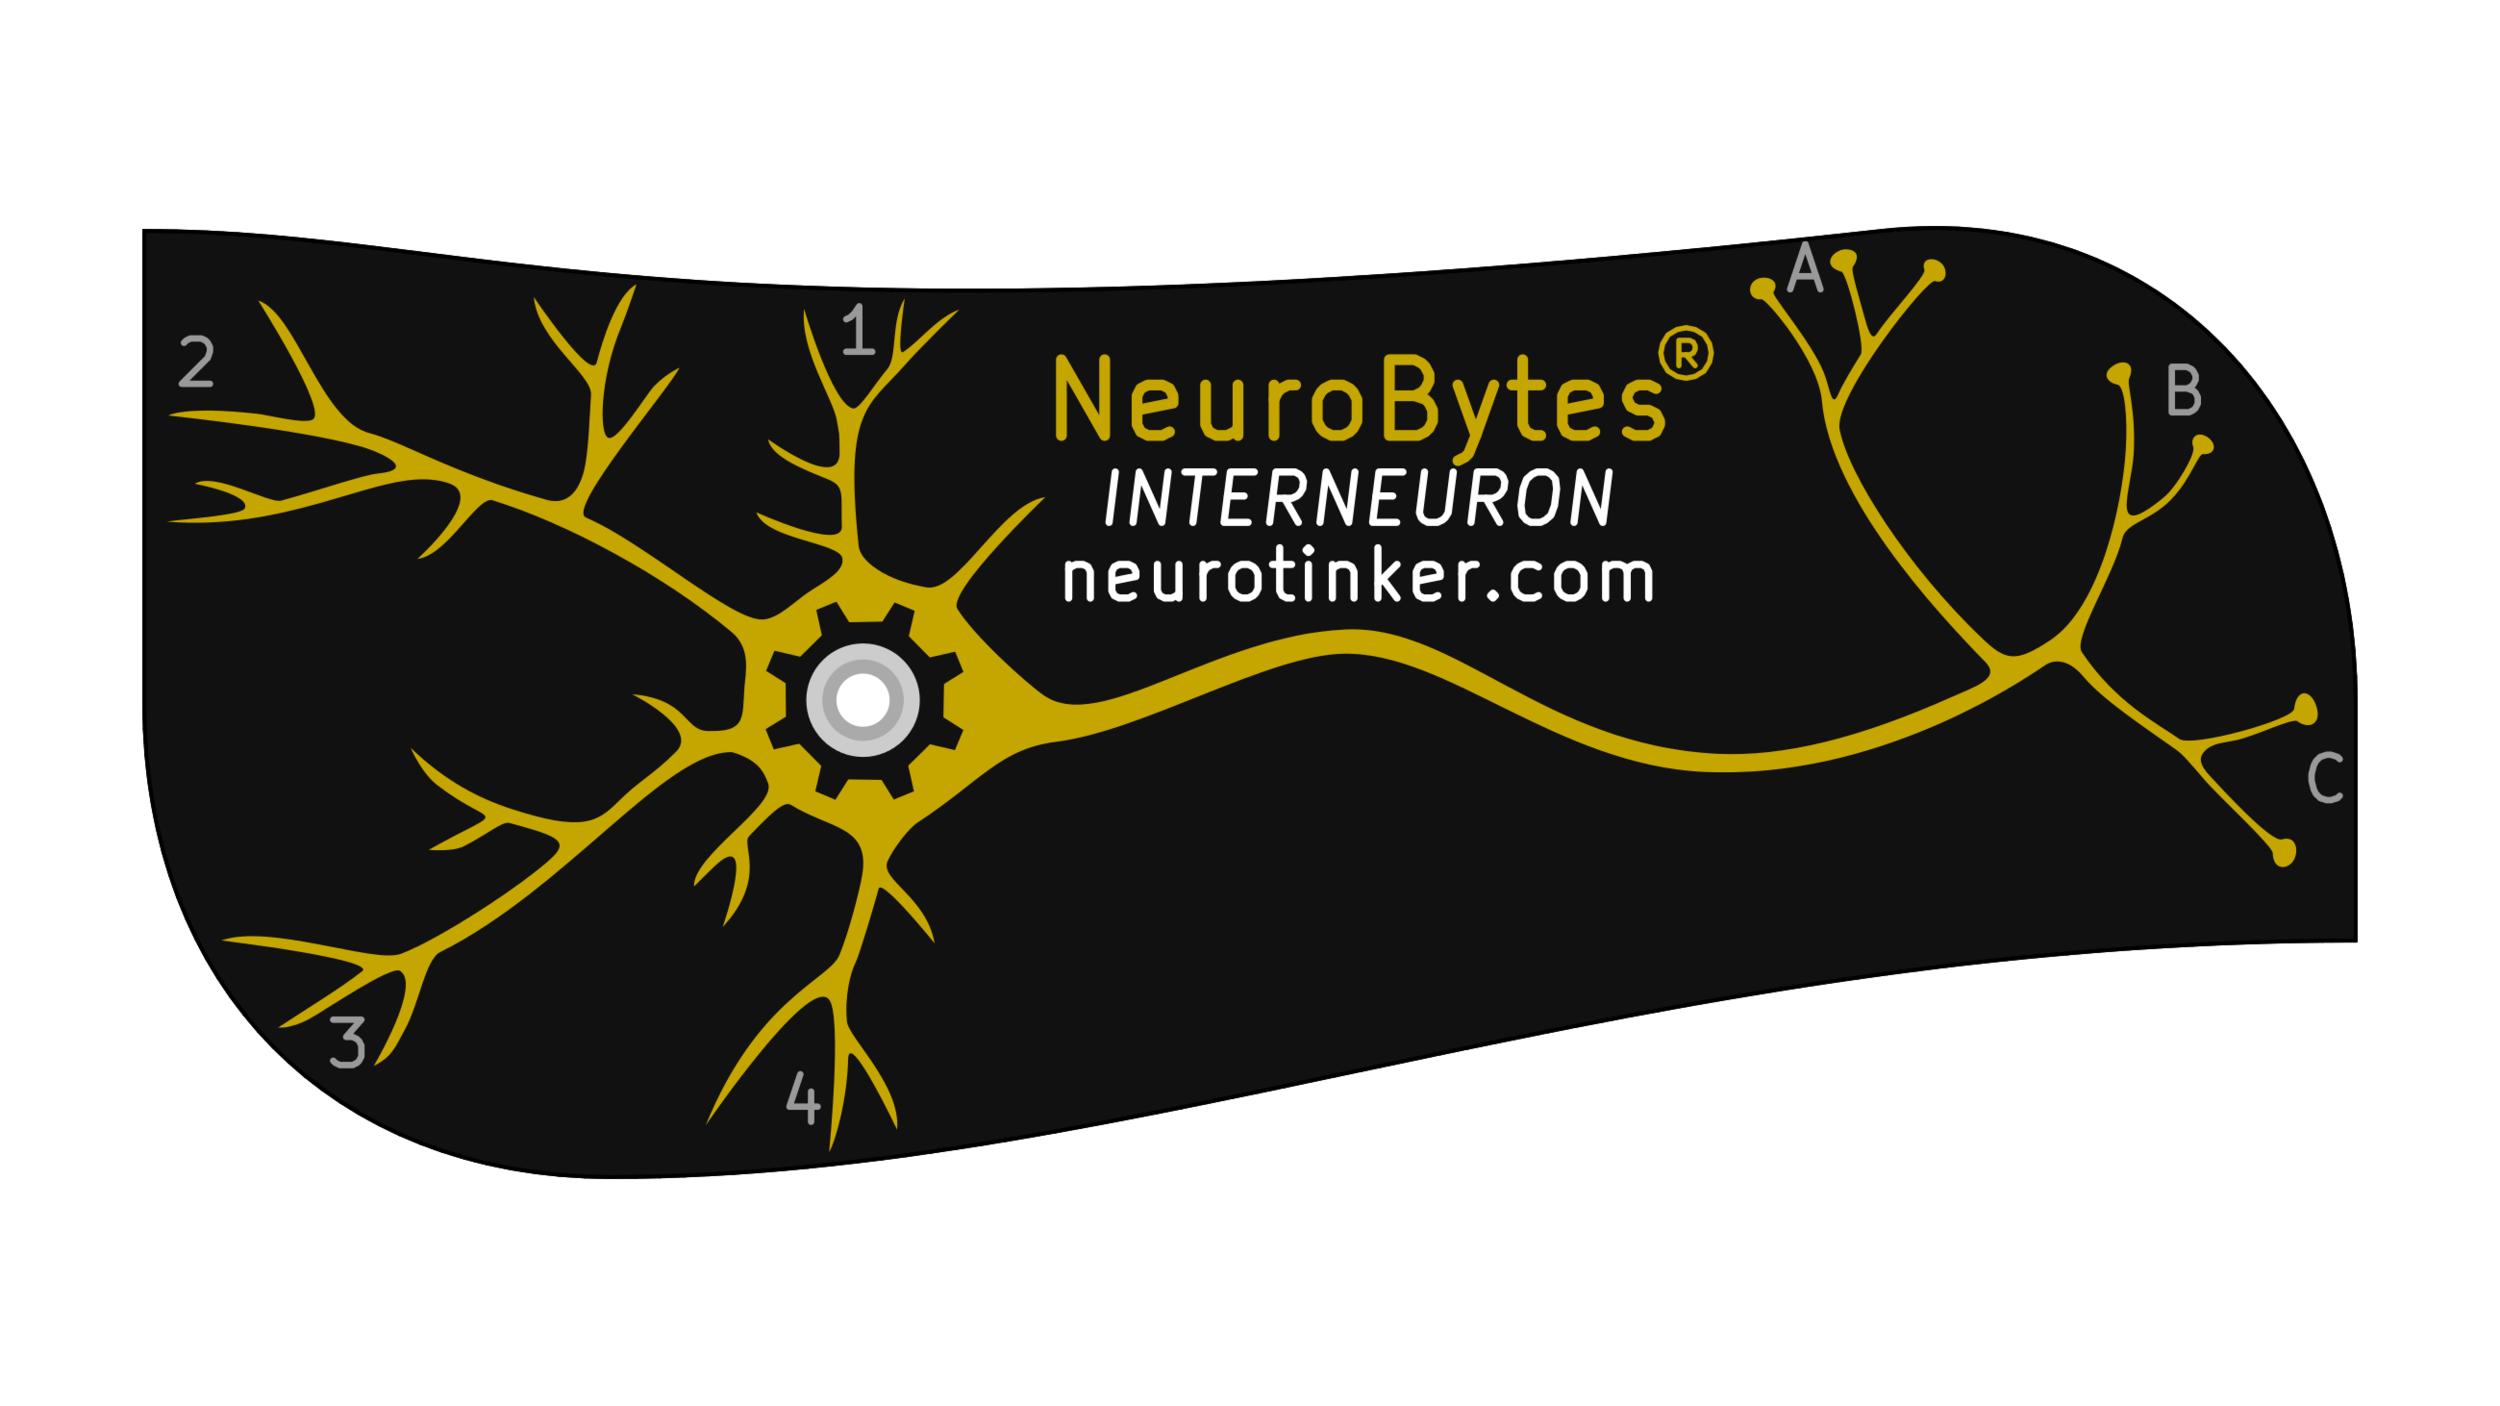 NeuroBytes_Interneuron.png